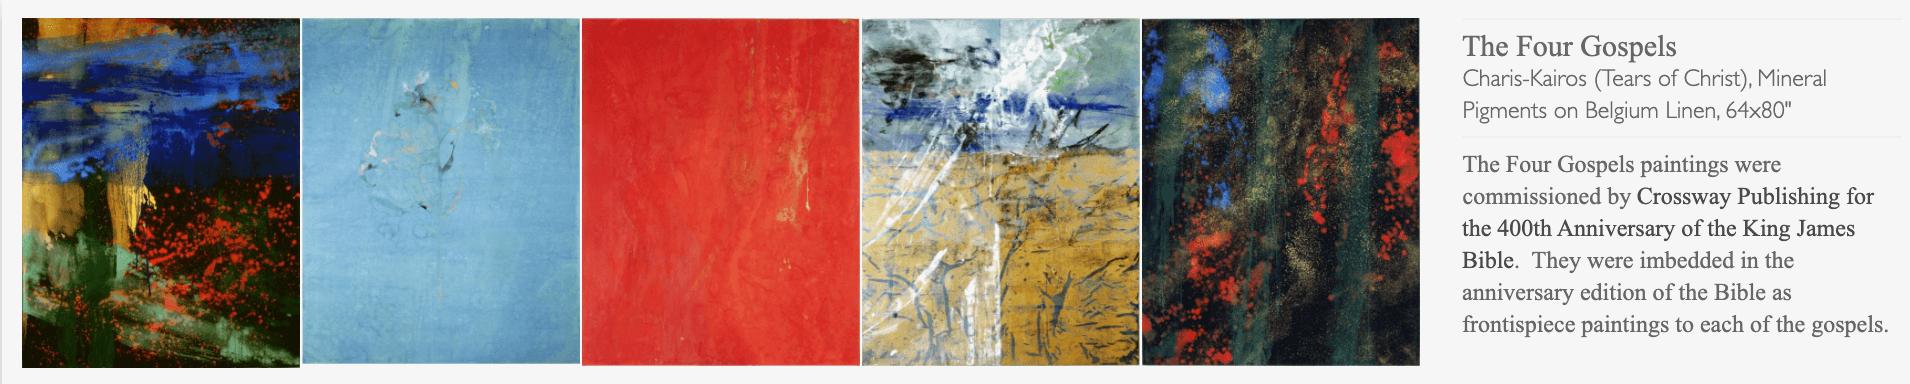 Works by Makoto Fujimura, The Four Gospels